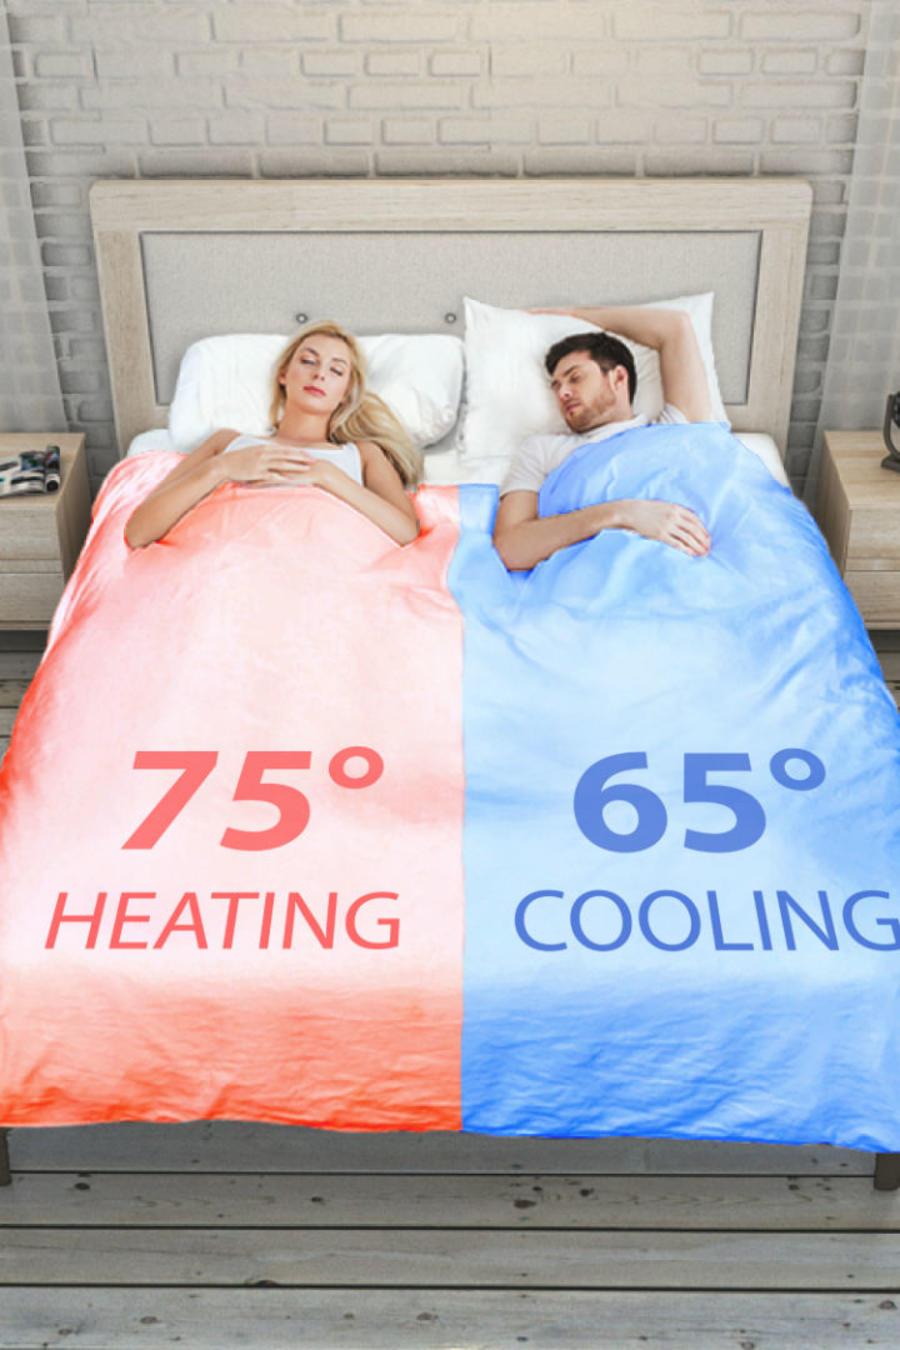 Pareja en la cama usando un smart duver breeze